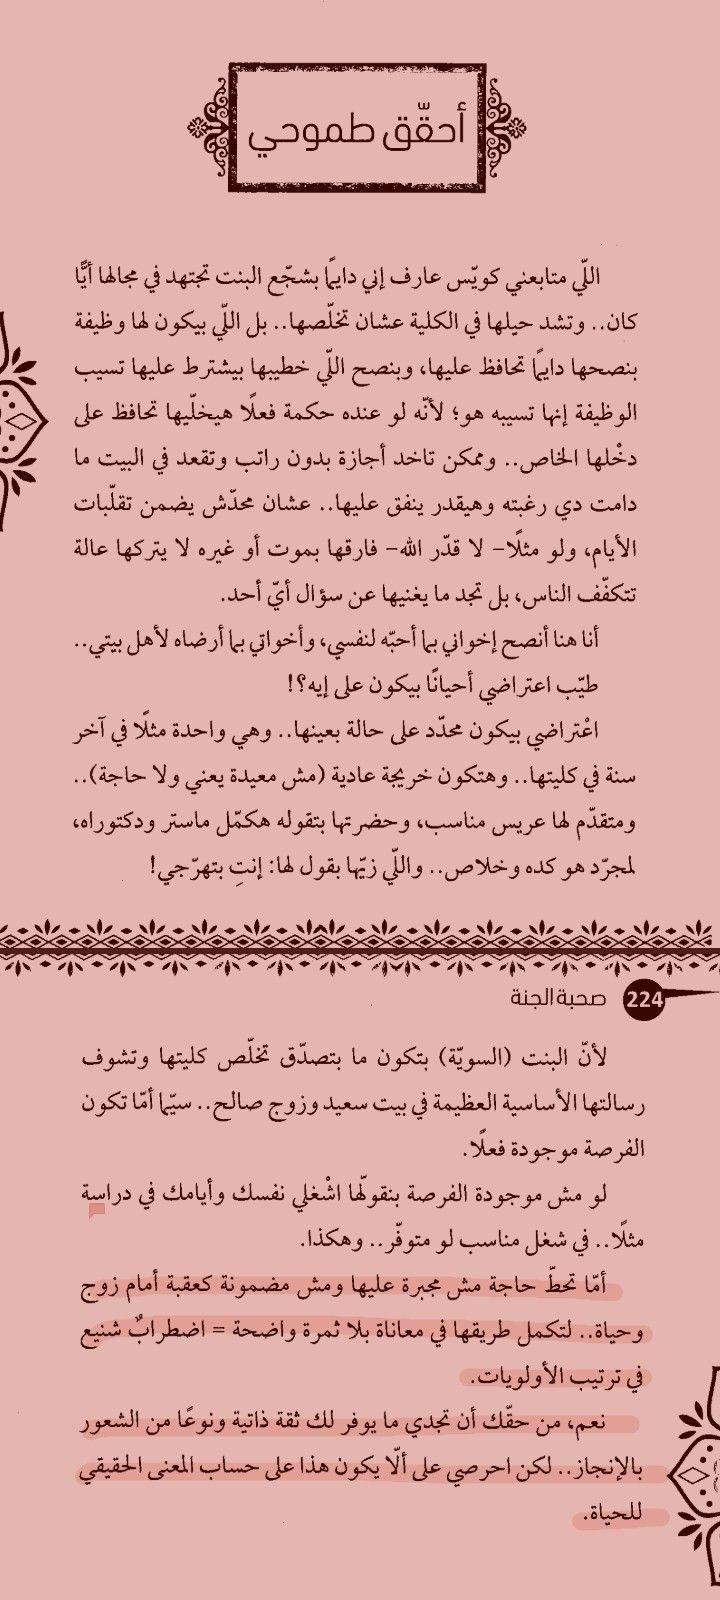 Pin By مسلمة On فوائد من الكتب Sheet Music Music